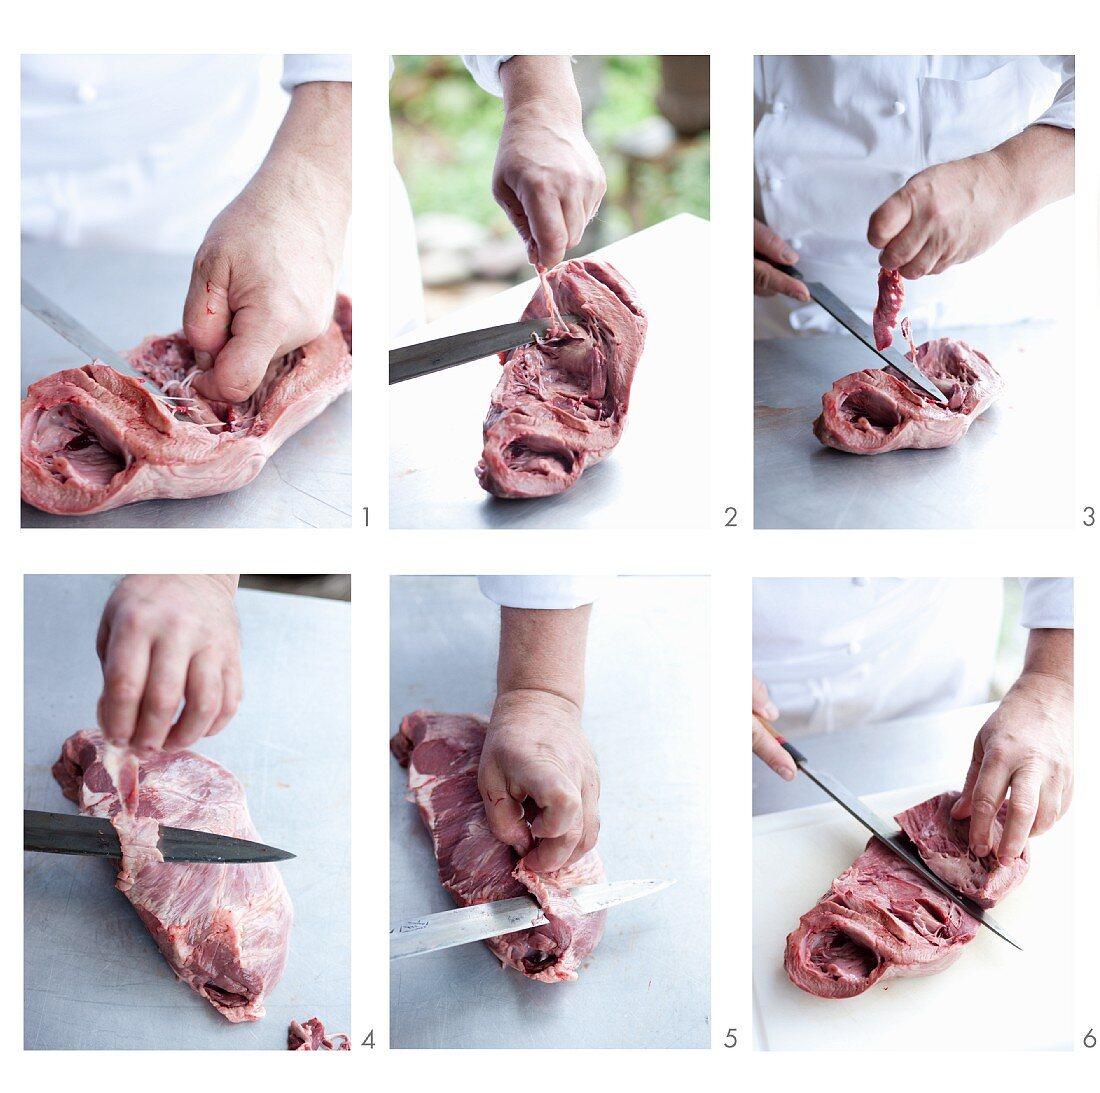 Veal heart being prepared